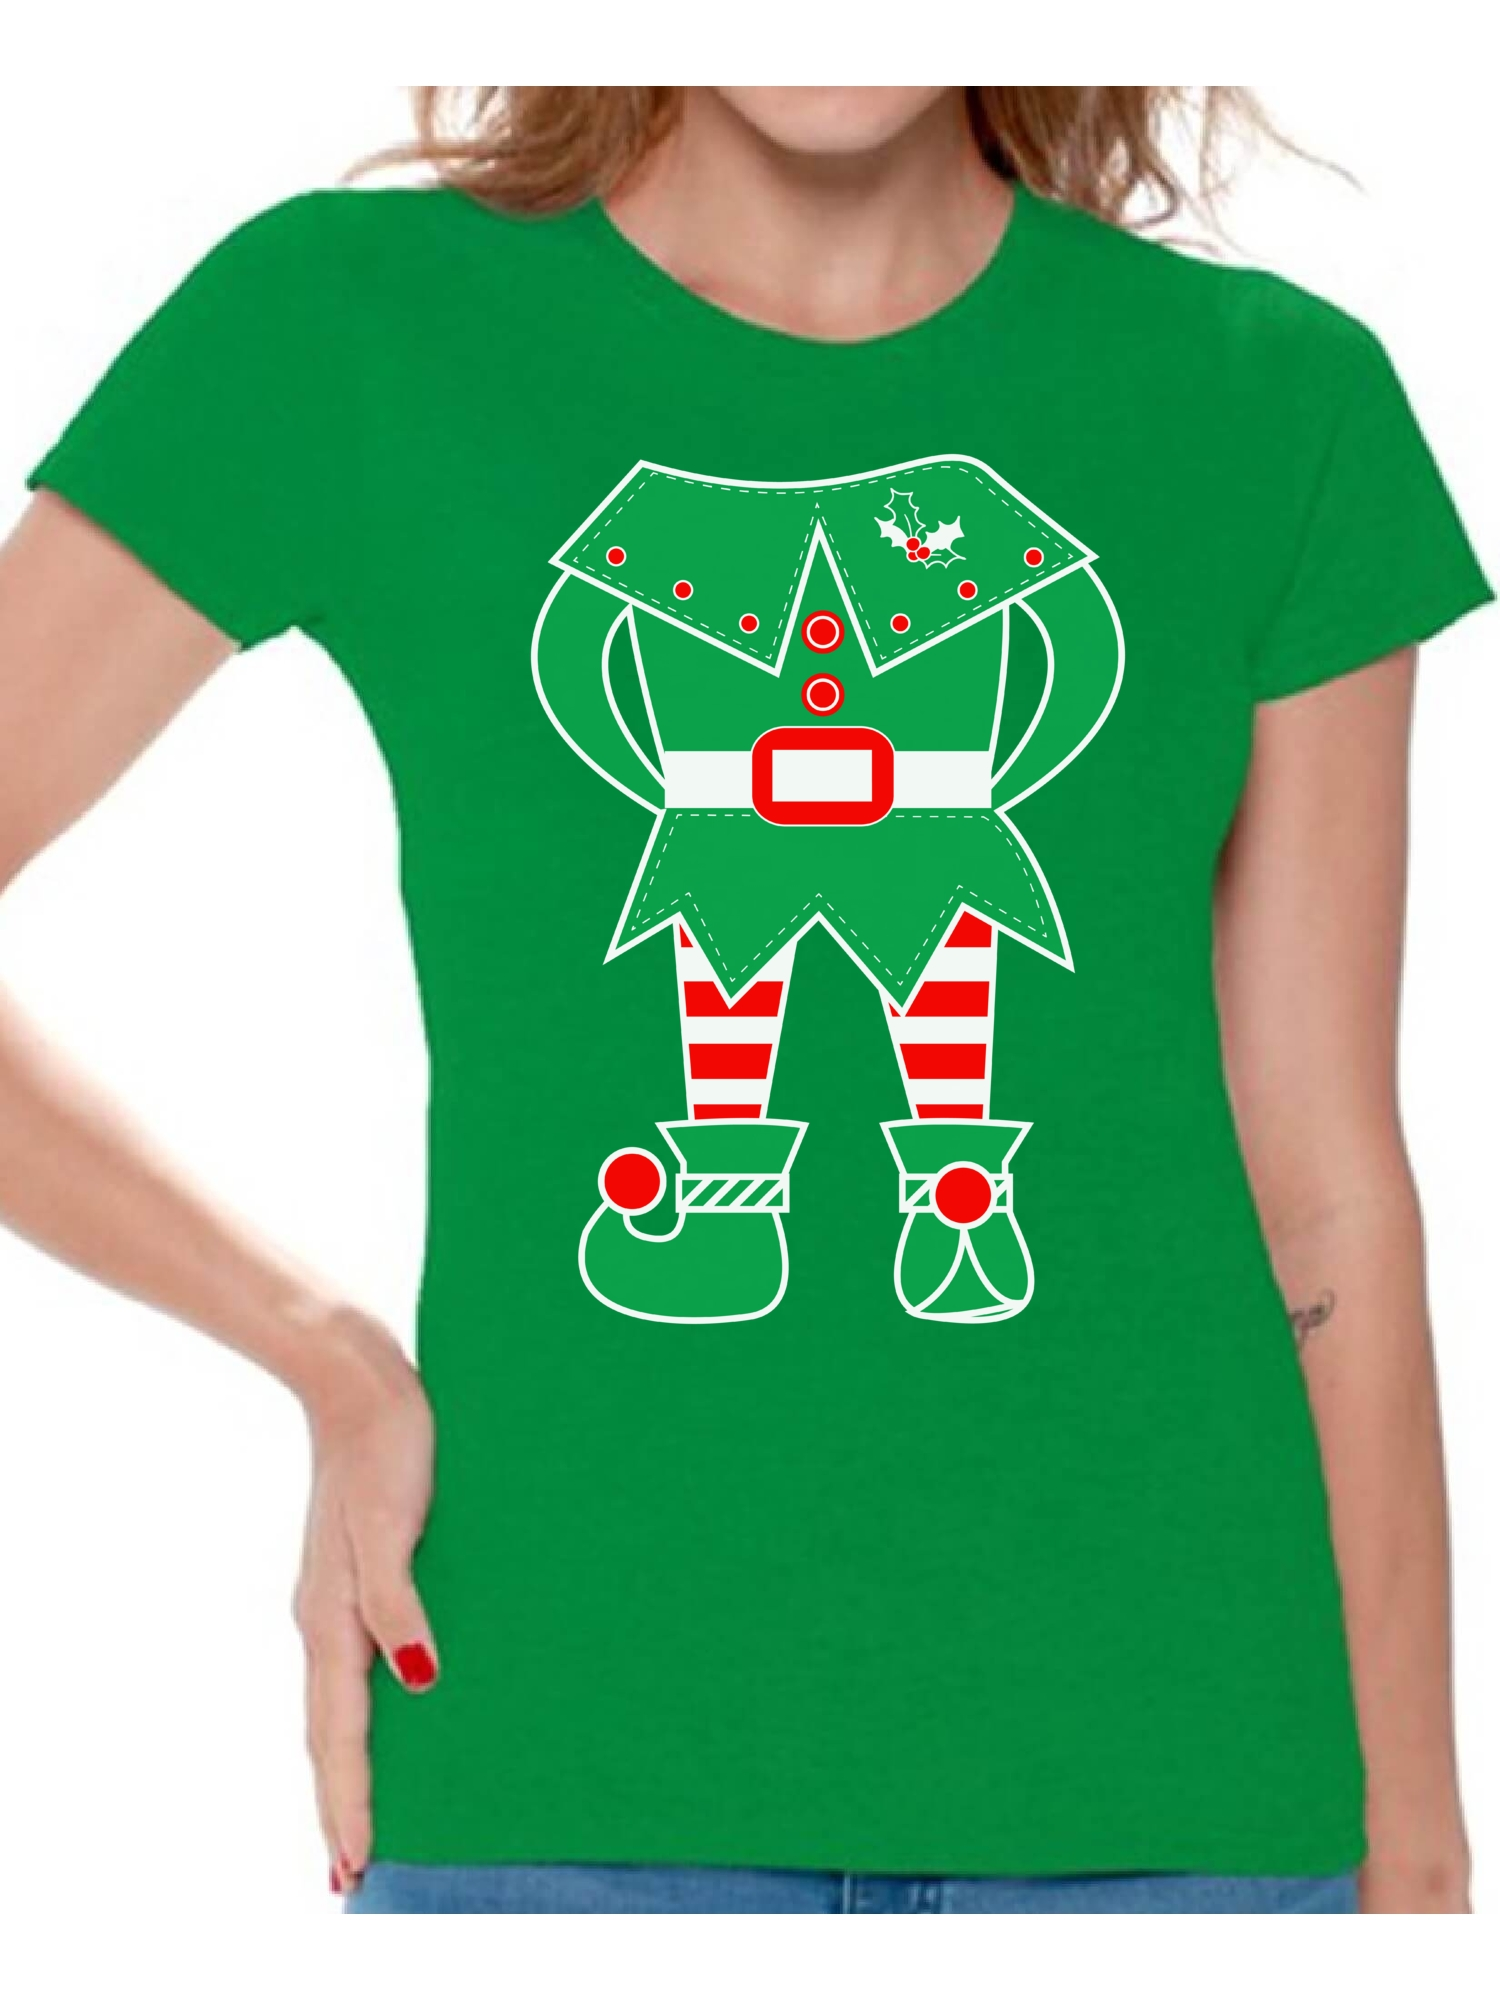 098ff0e71b Awkward Styles Elf Shirt Christmas T Shirts for Women Elf Suit Women's  Holiday Top Funny Elf Shirt Women's Christmas T-Shirt Family Elf Holiday Shirt  Xmas ...